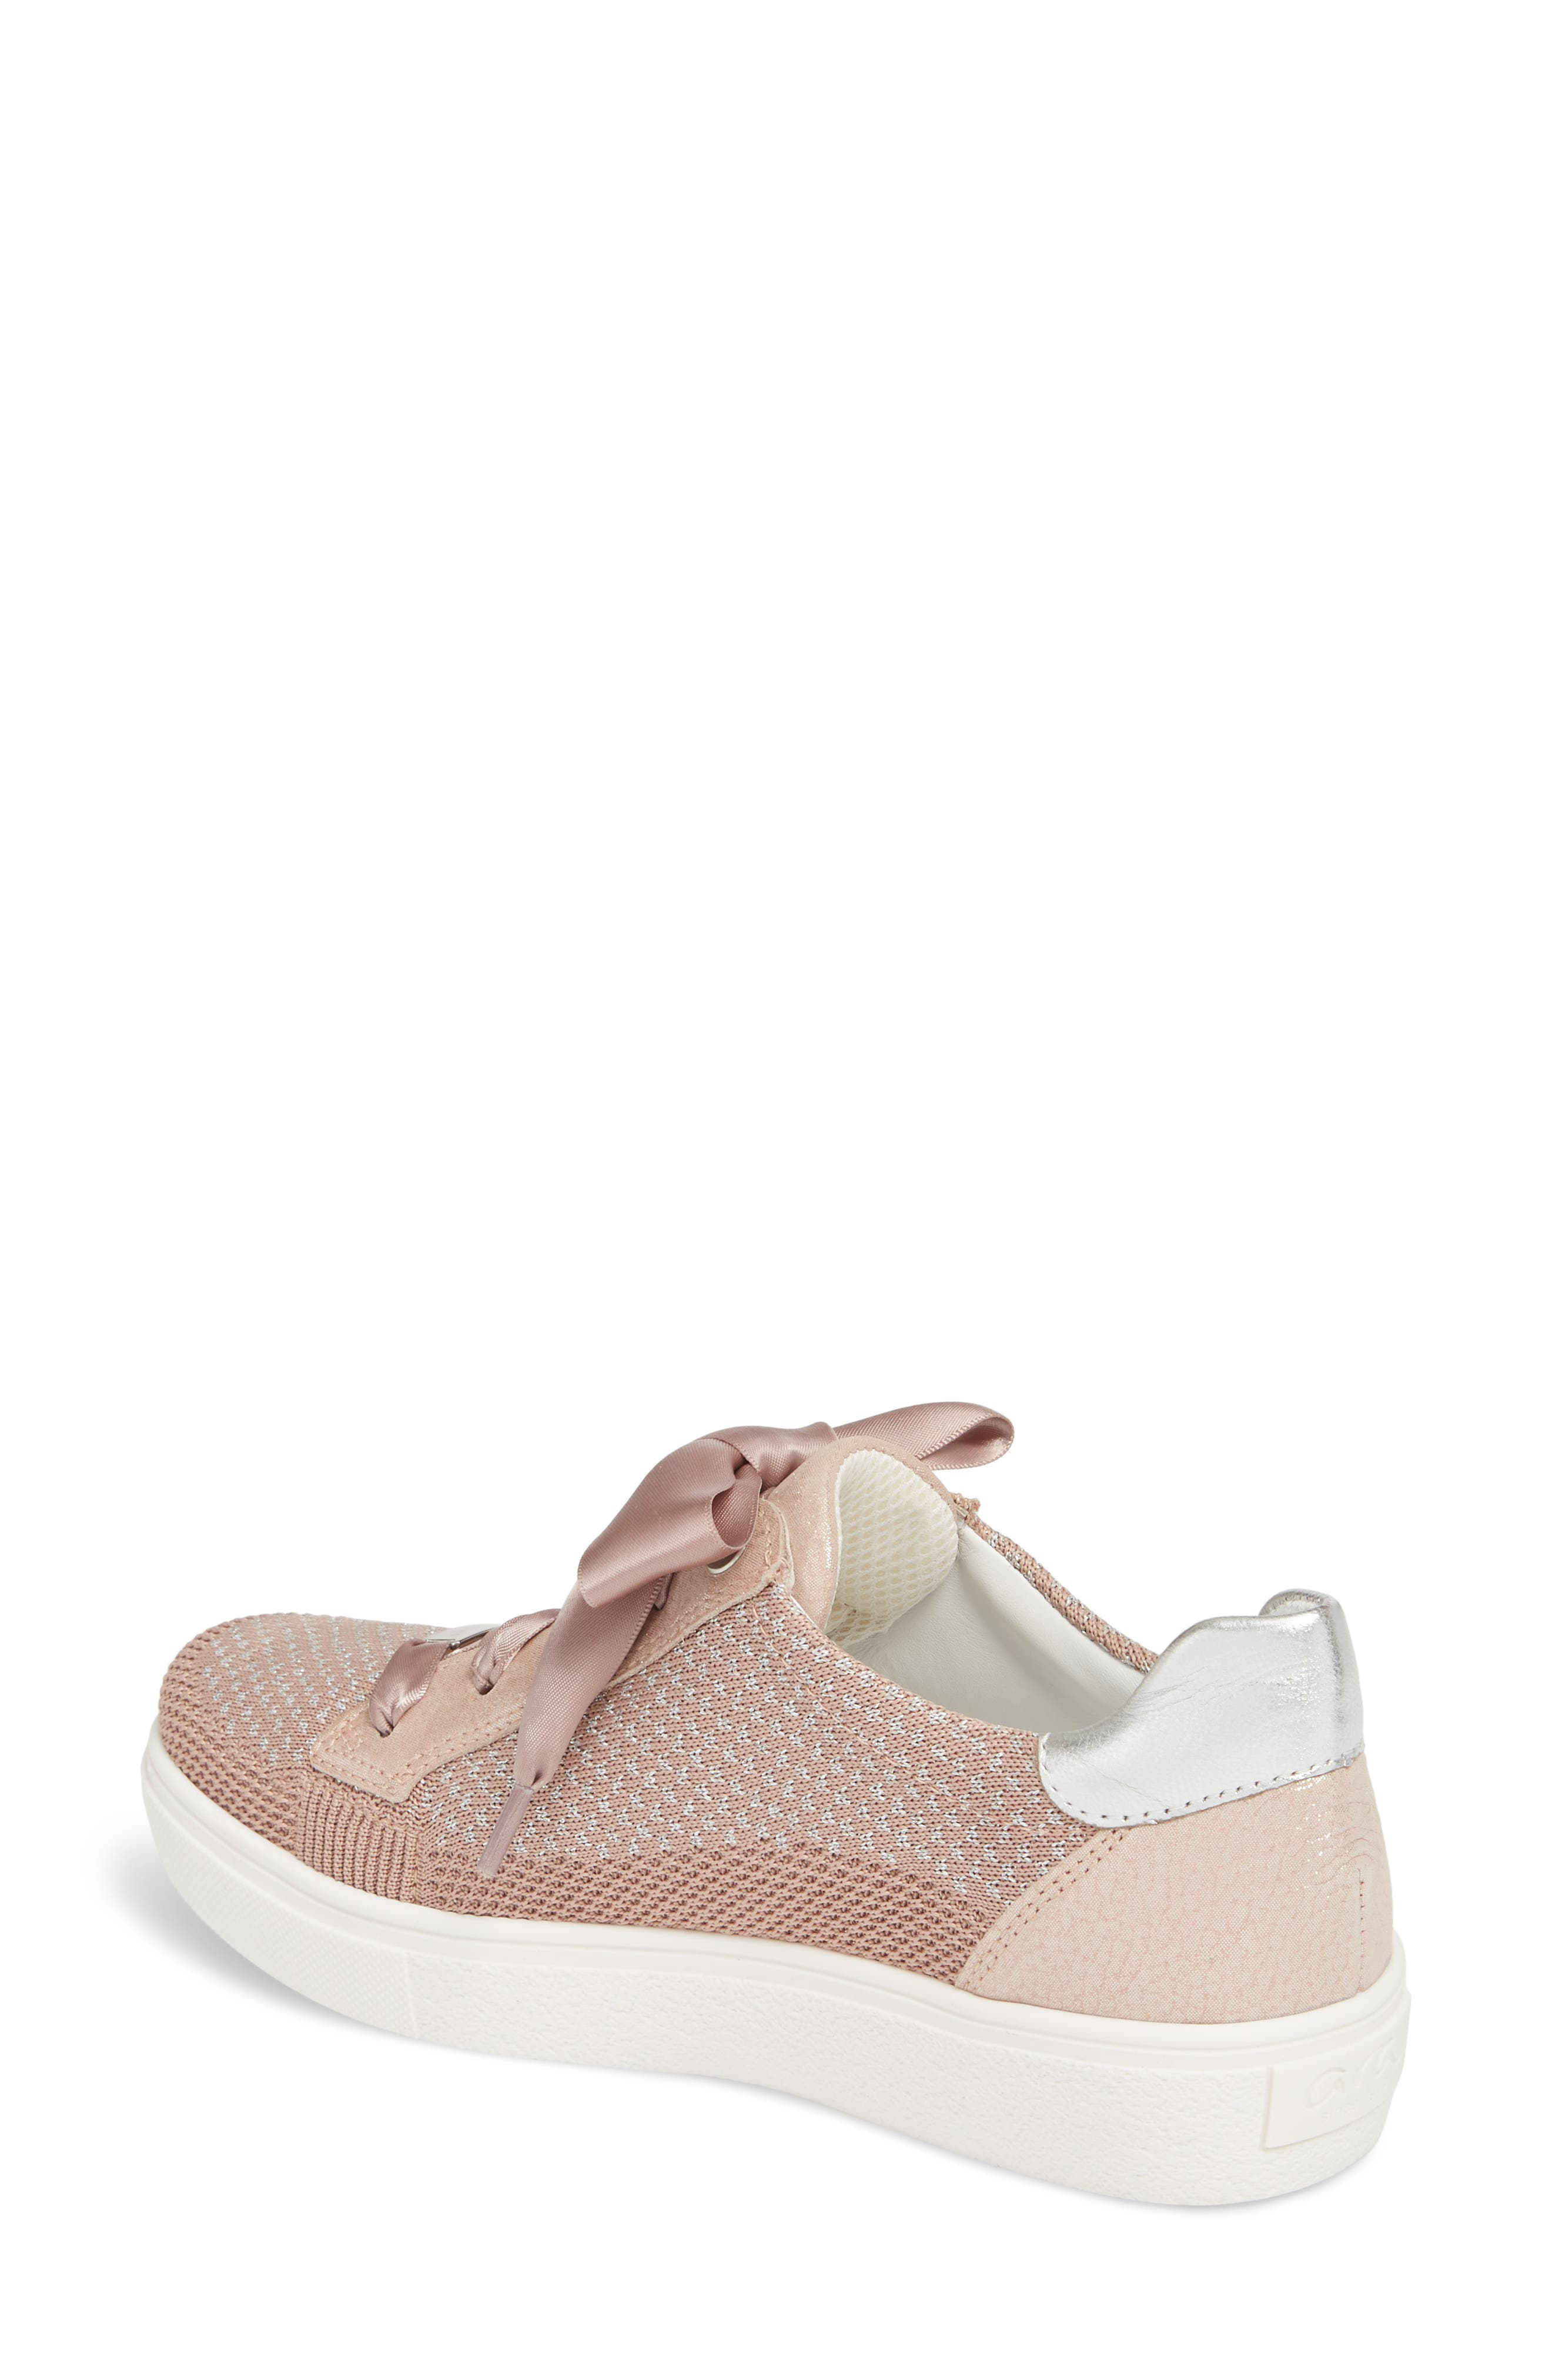 Natalya Sneaker,                             Alternate thumbnail 2, color,                             POWDER FABRIC